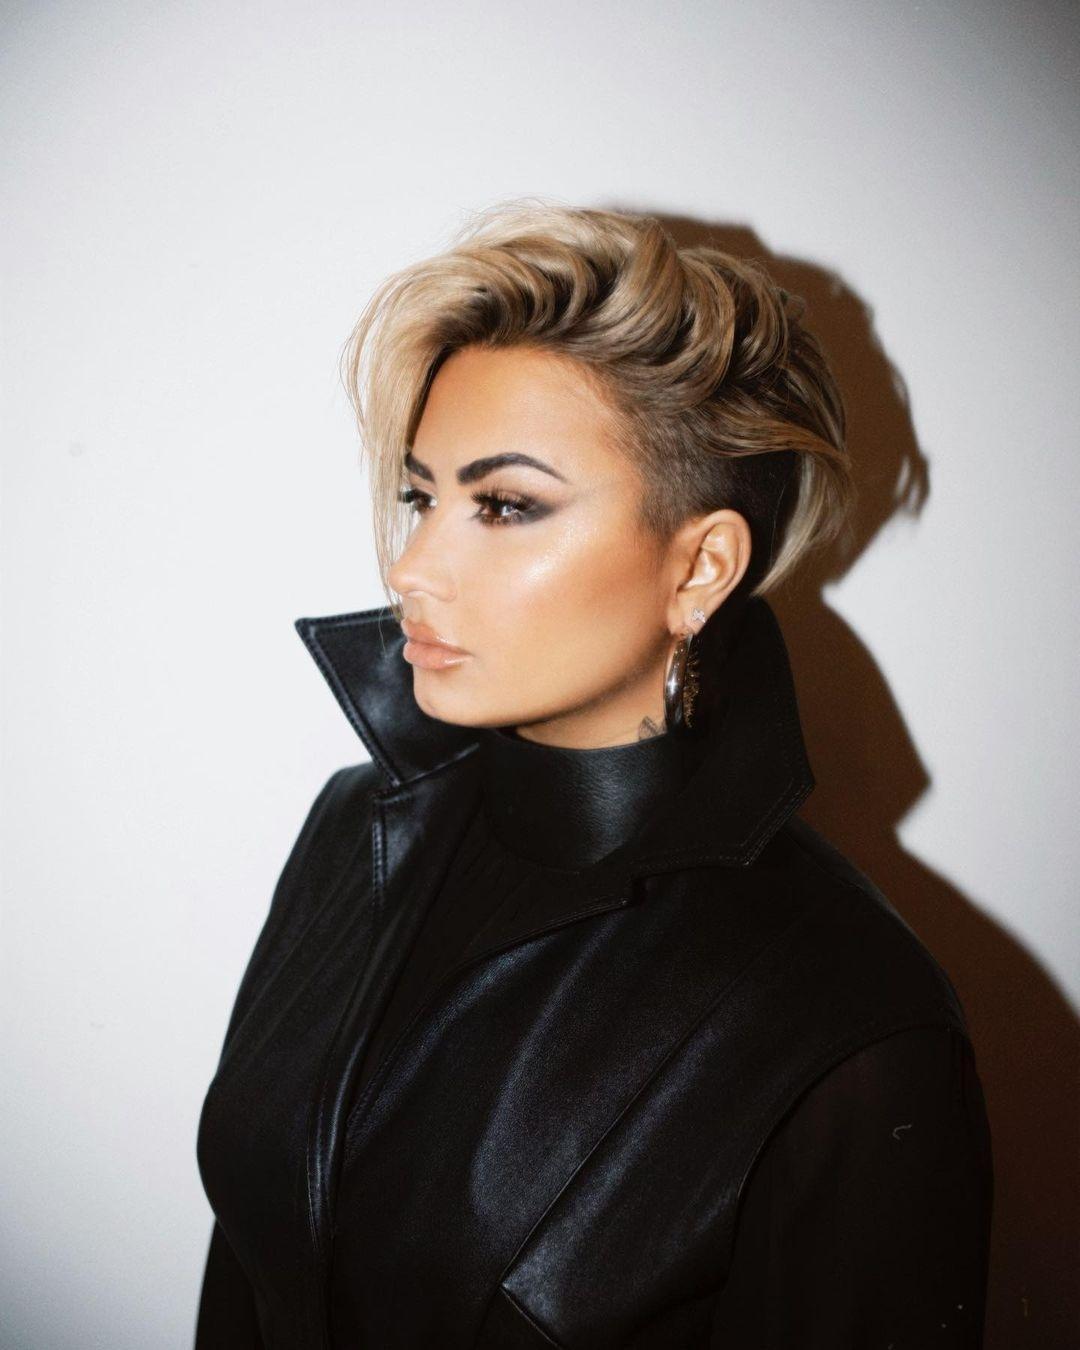 Demi Lovato radicaliza o visual e aparece com cabelo curto - 19/11/2020 -  UOL TV e Famosos